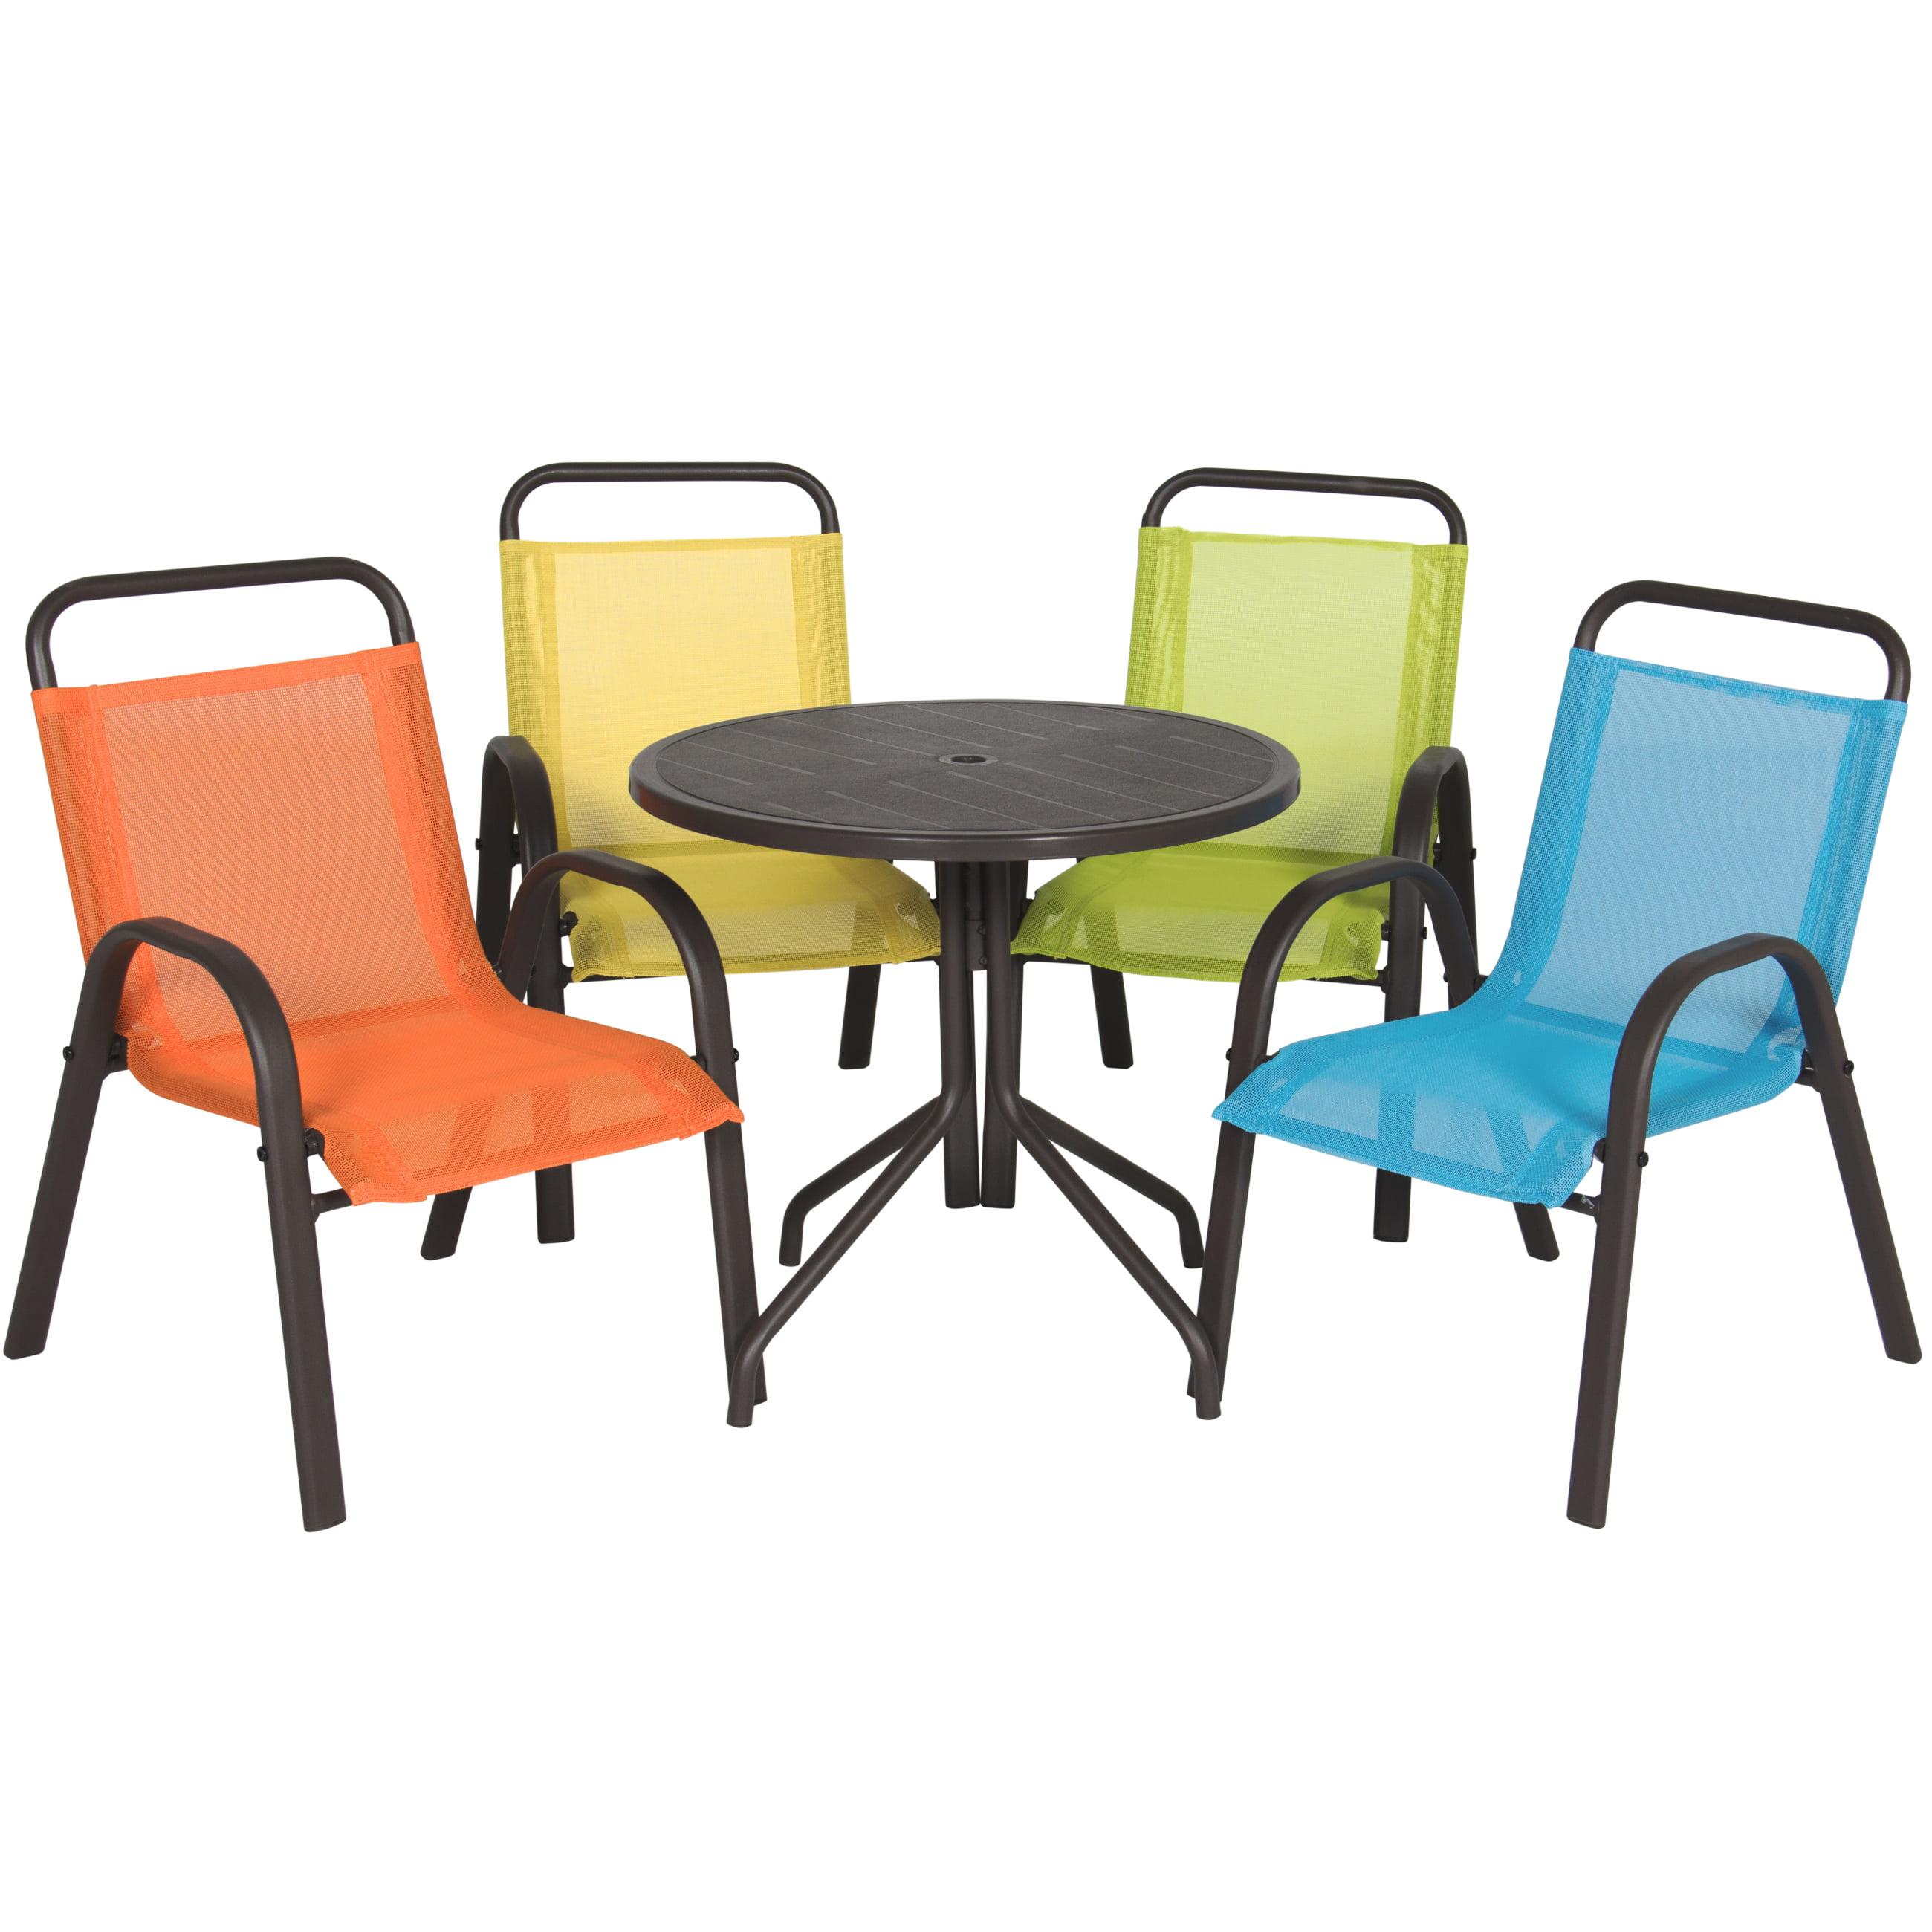 Best Choice Products Outdoor/Indoor 5 Piece Junior Kids Furniture